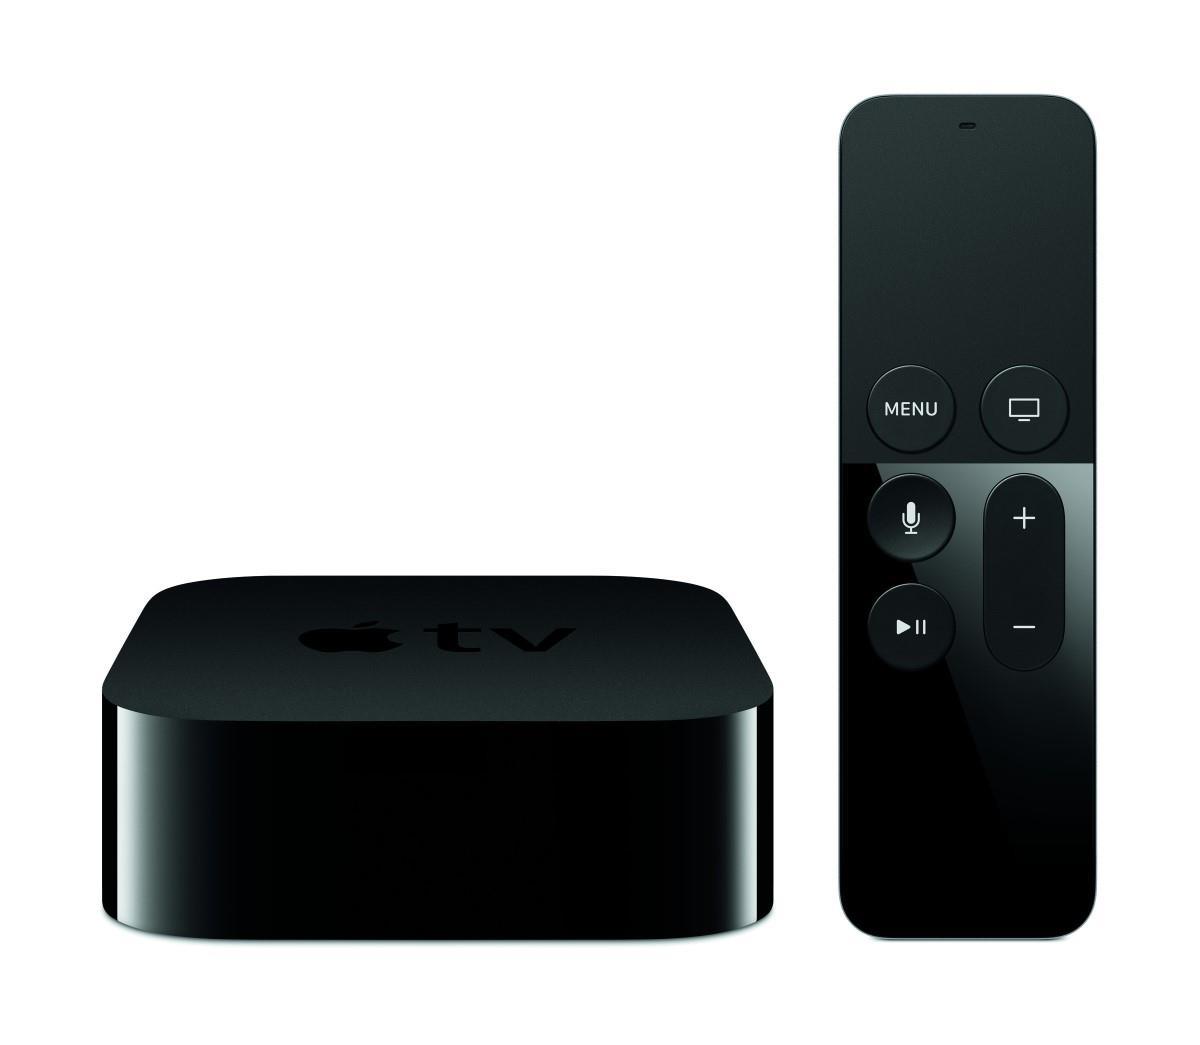 Apple Internet TV - 64 GB HDD - Wireless LAN